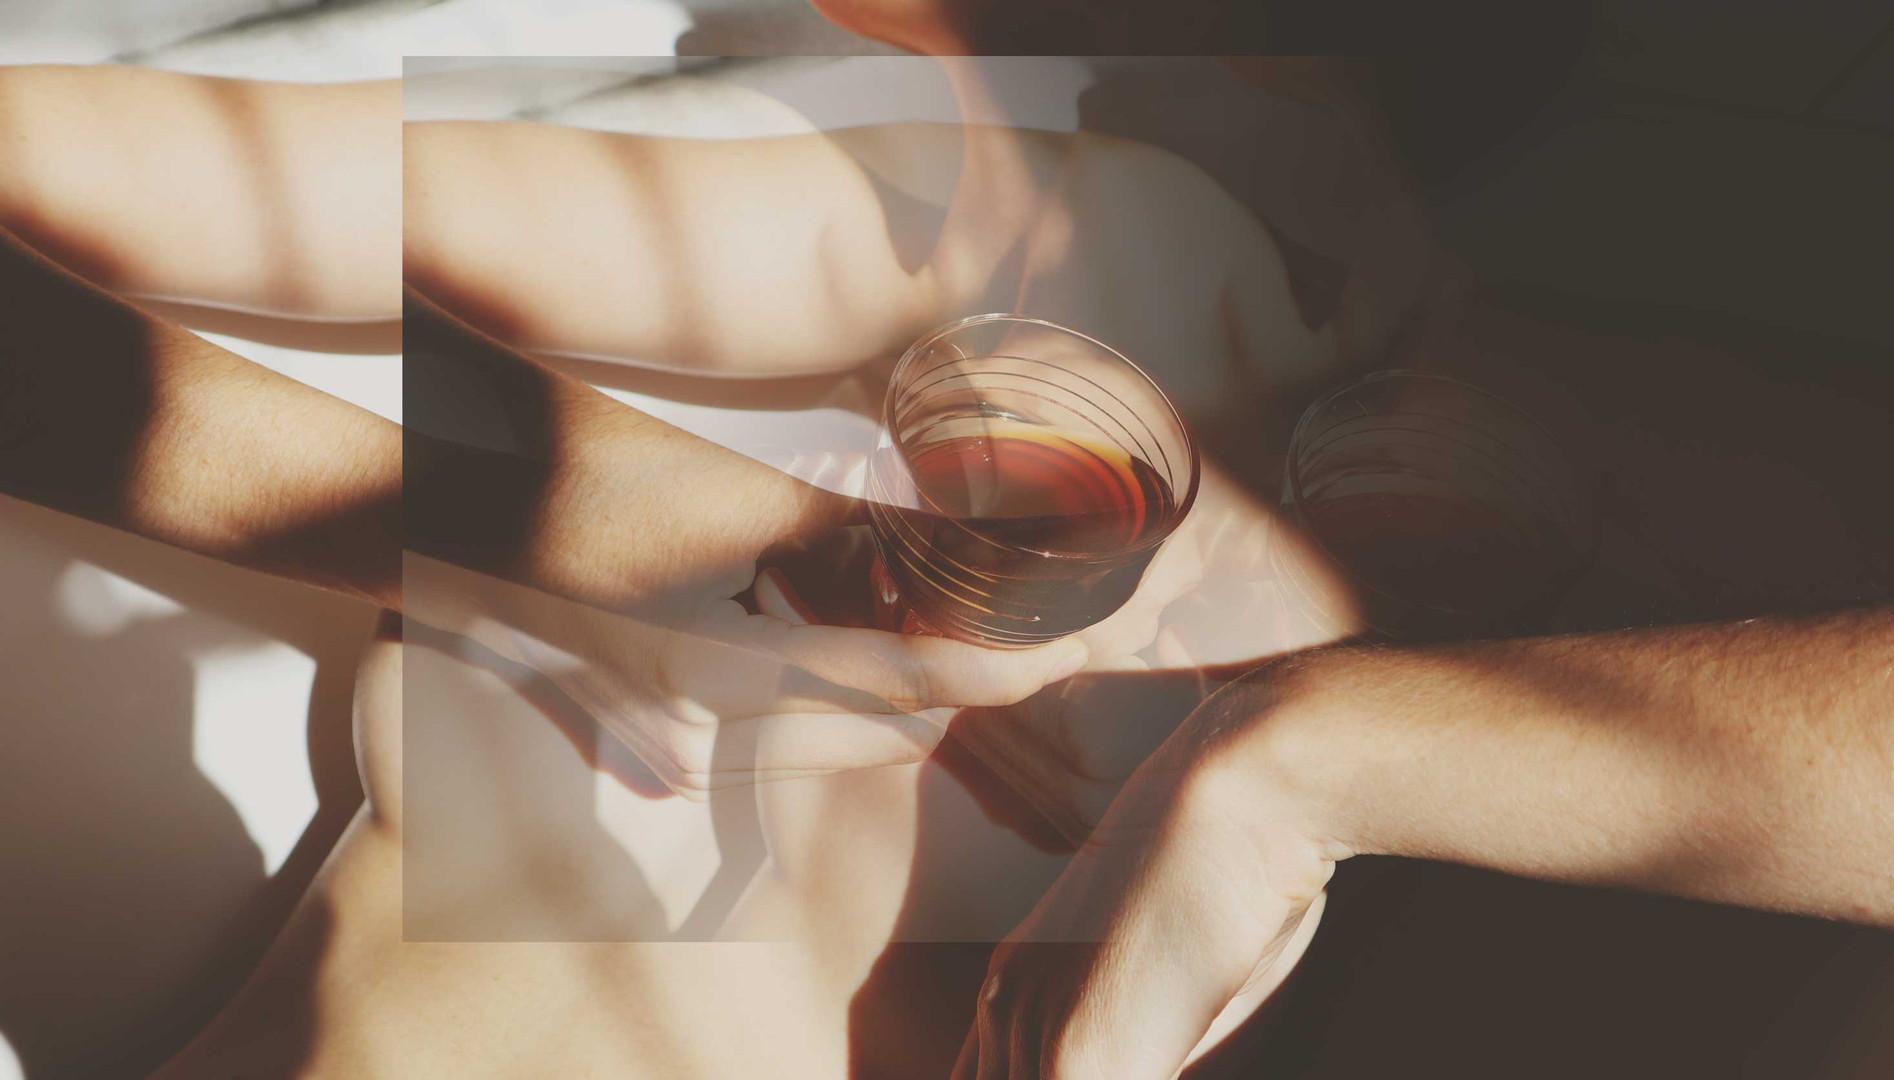 girl-drinking-coffee-in-bath.jpg